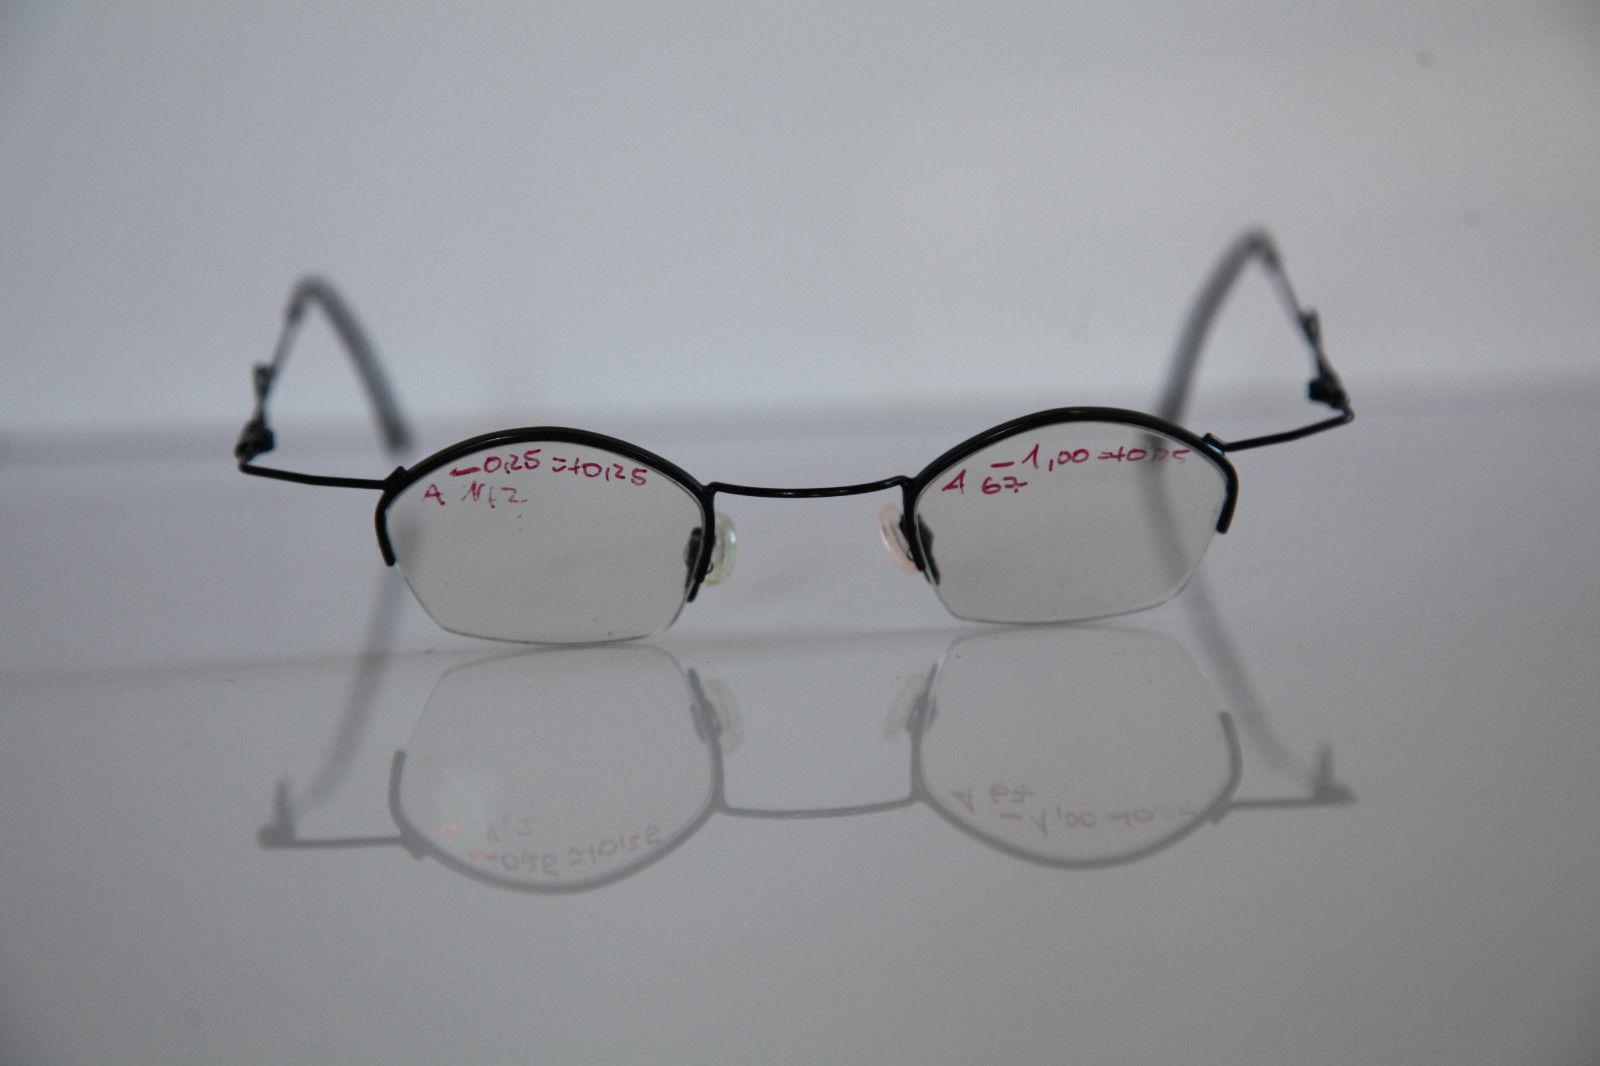 FREESTYLE ARGENTA Eyewear, Black Half Rimless Frame,   RX-Able Prescription.